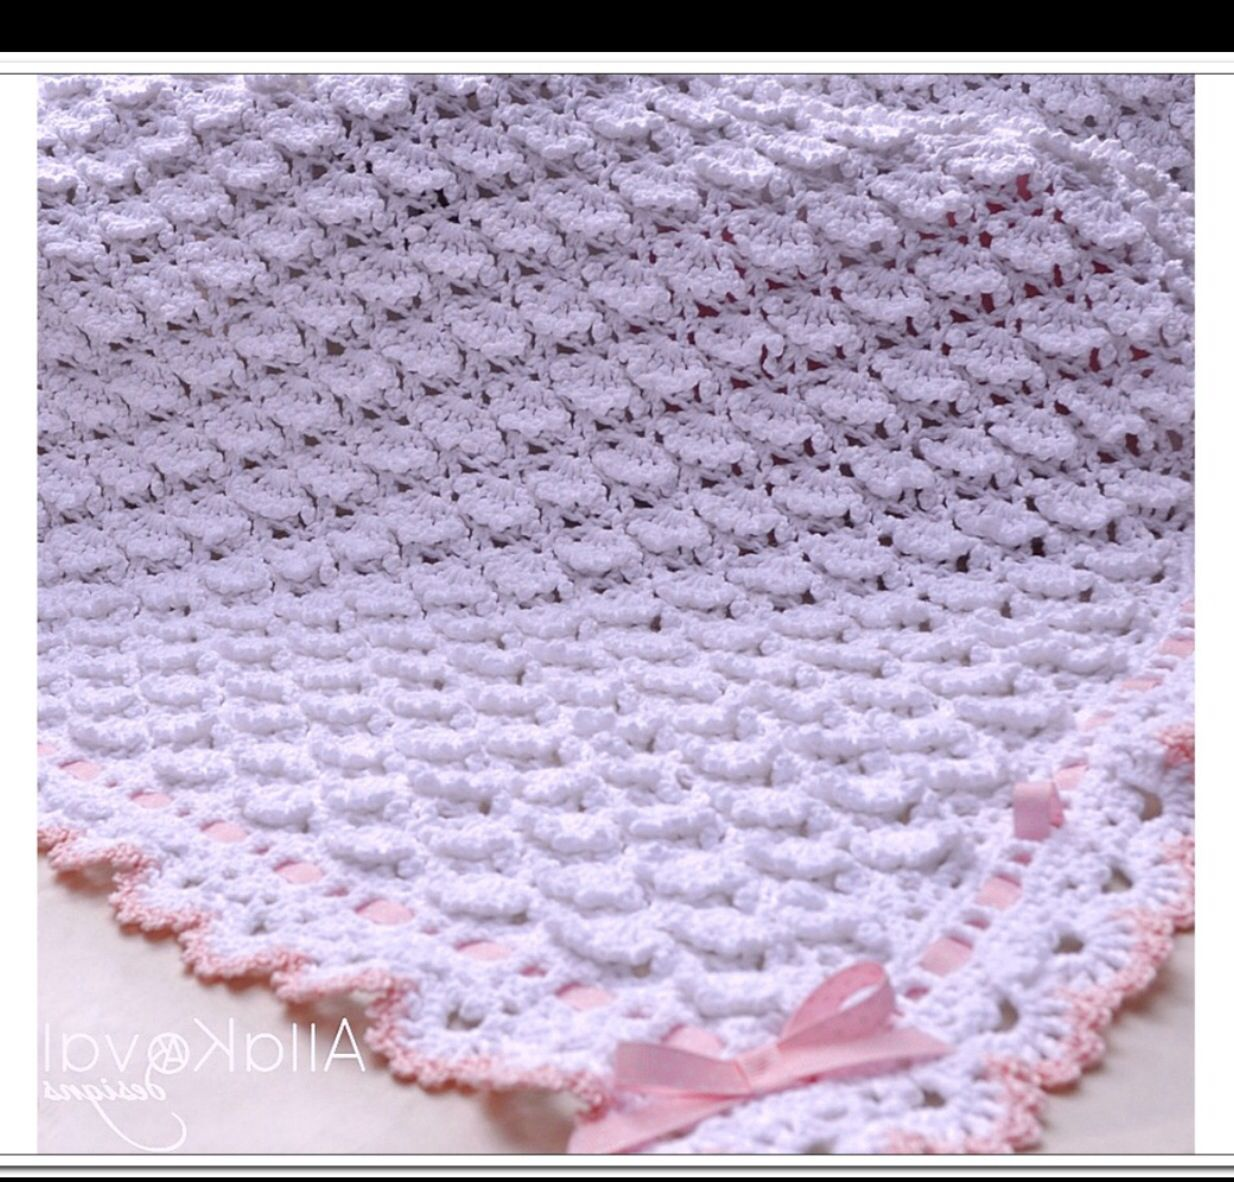 Manta del mar | crocheting | Pinterest